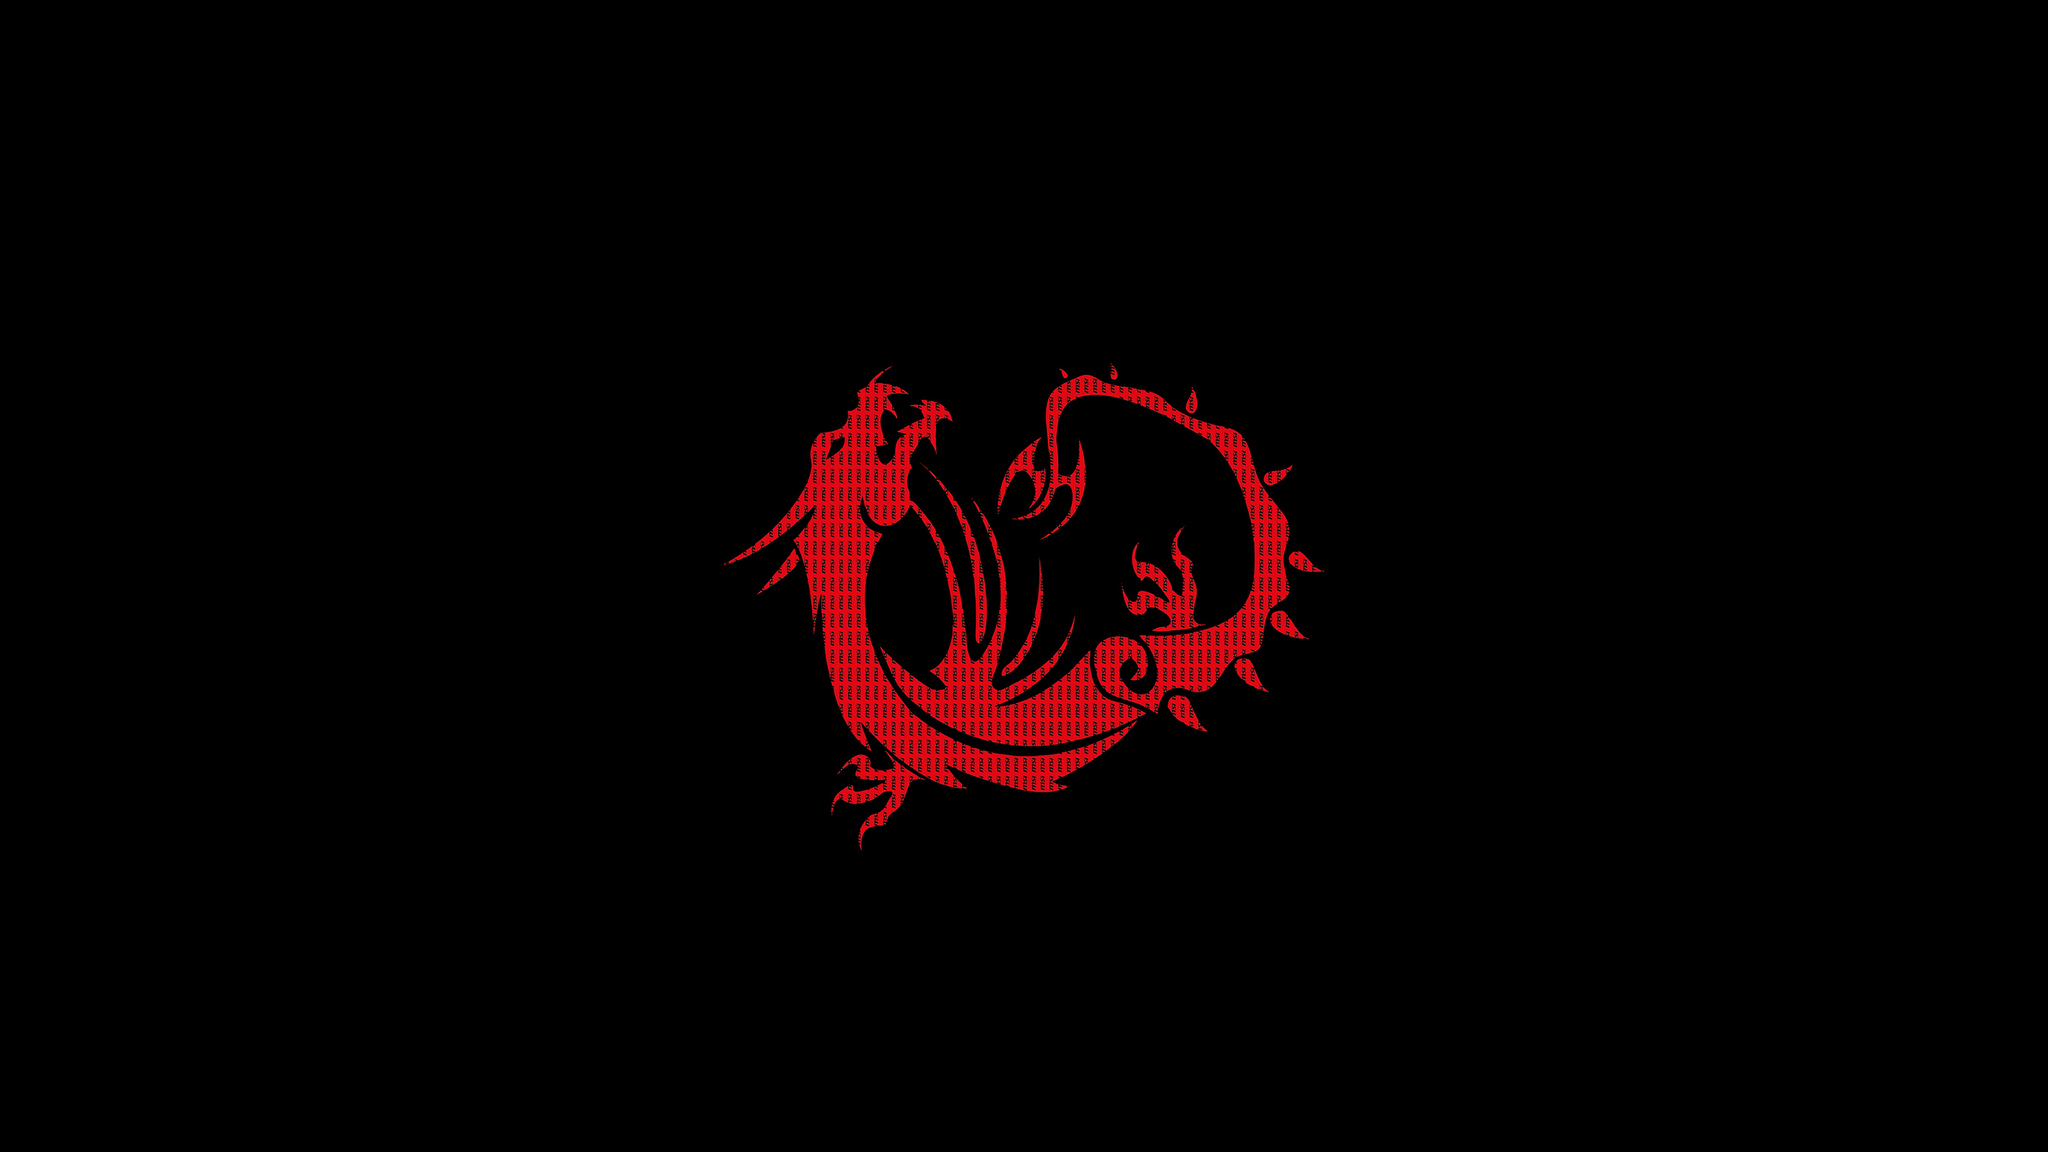 2048x1152 Red Dragon Black Minimal 4k 2048x1152 Resolution Hd 4k